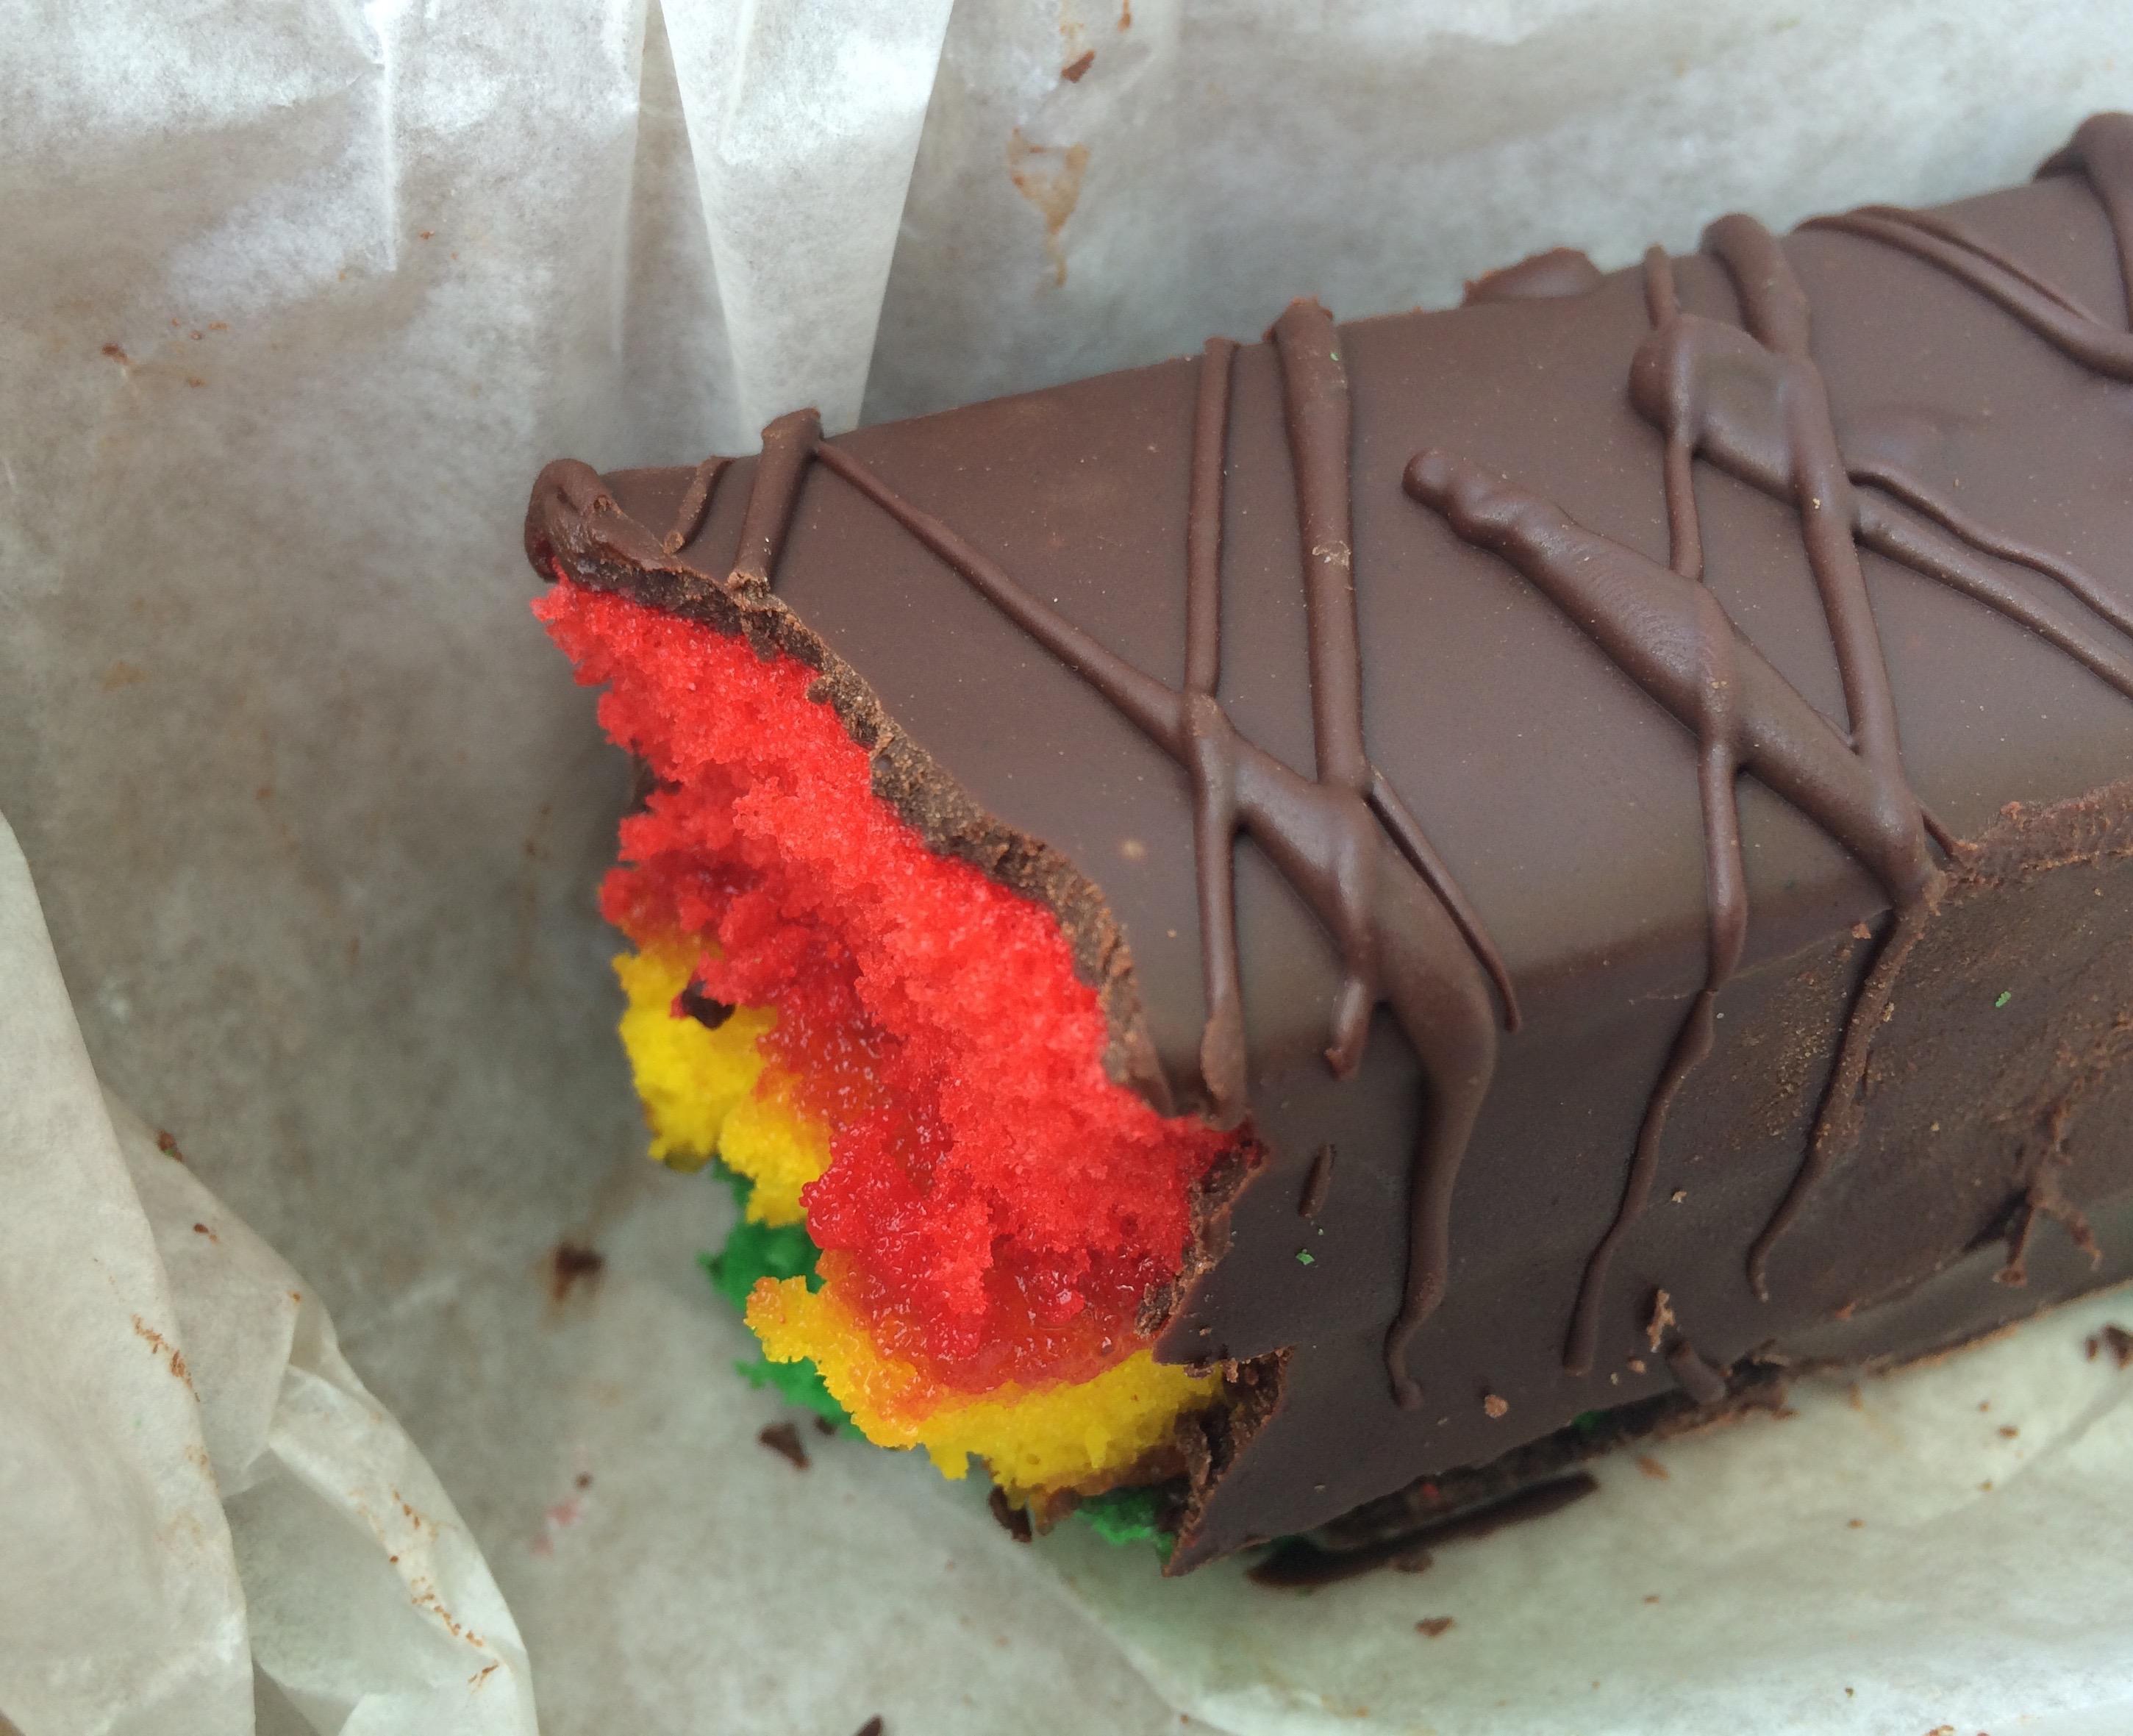 La Cheesecake - A College Point, Queens Institution - Borough Vegetarian